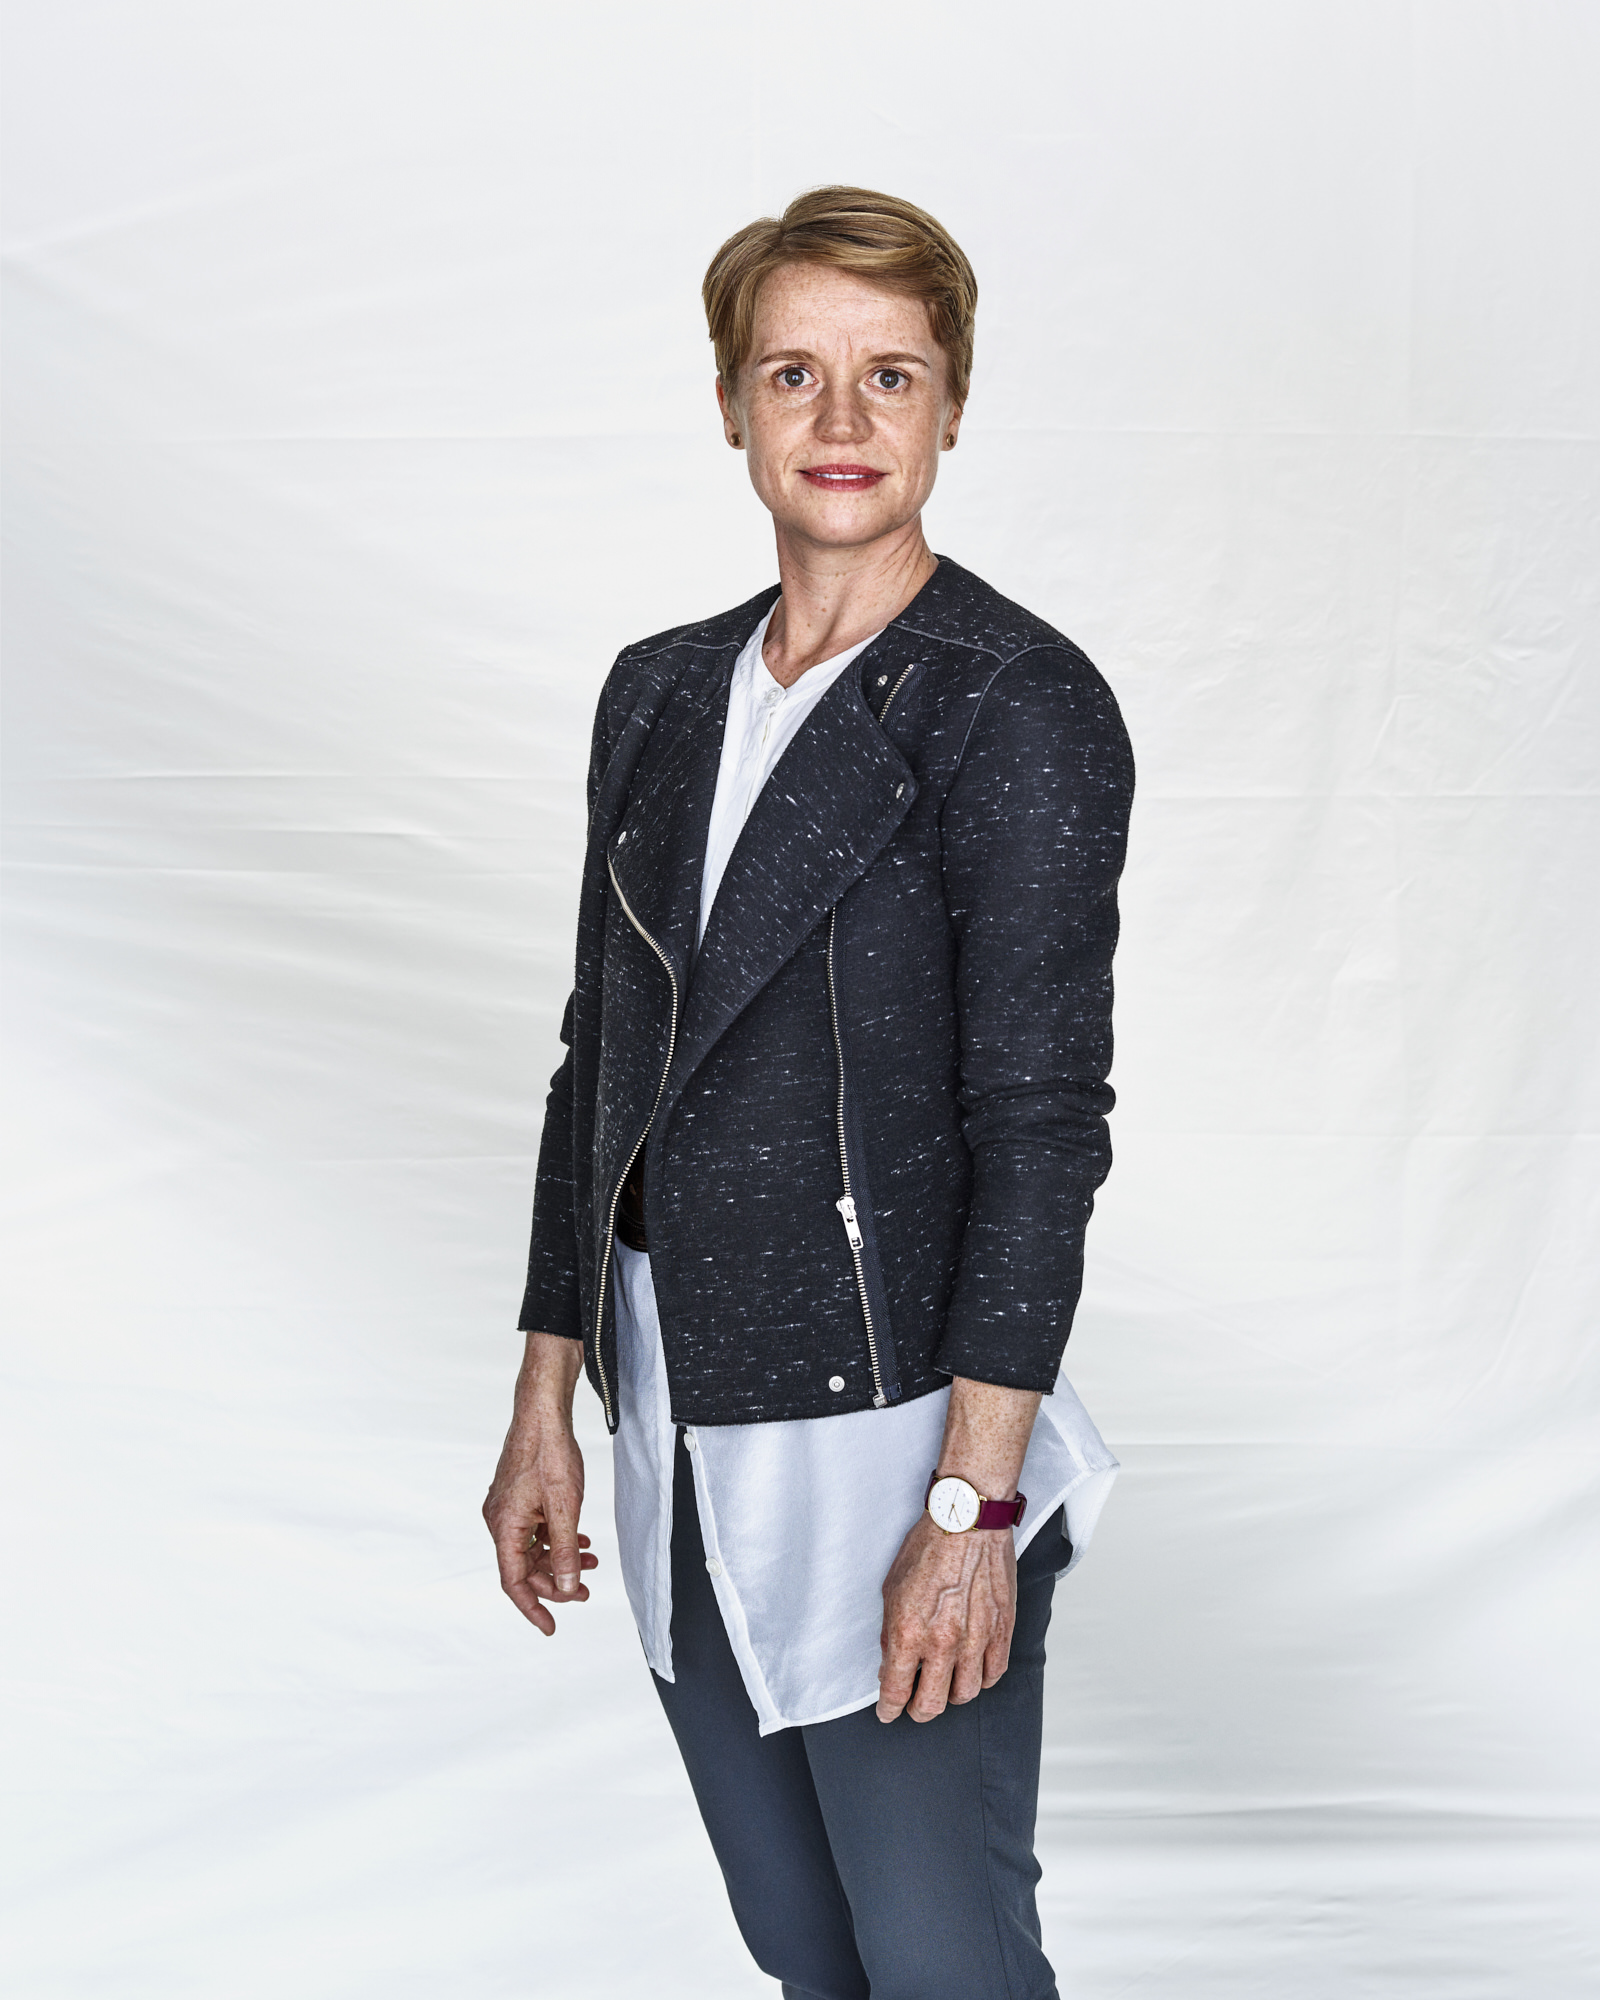 Silke Biermann